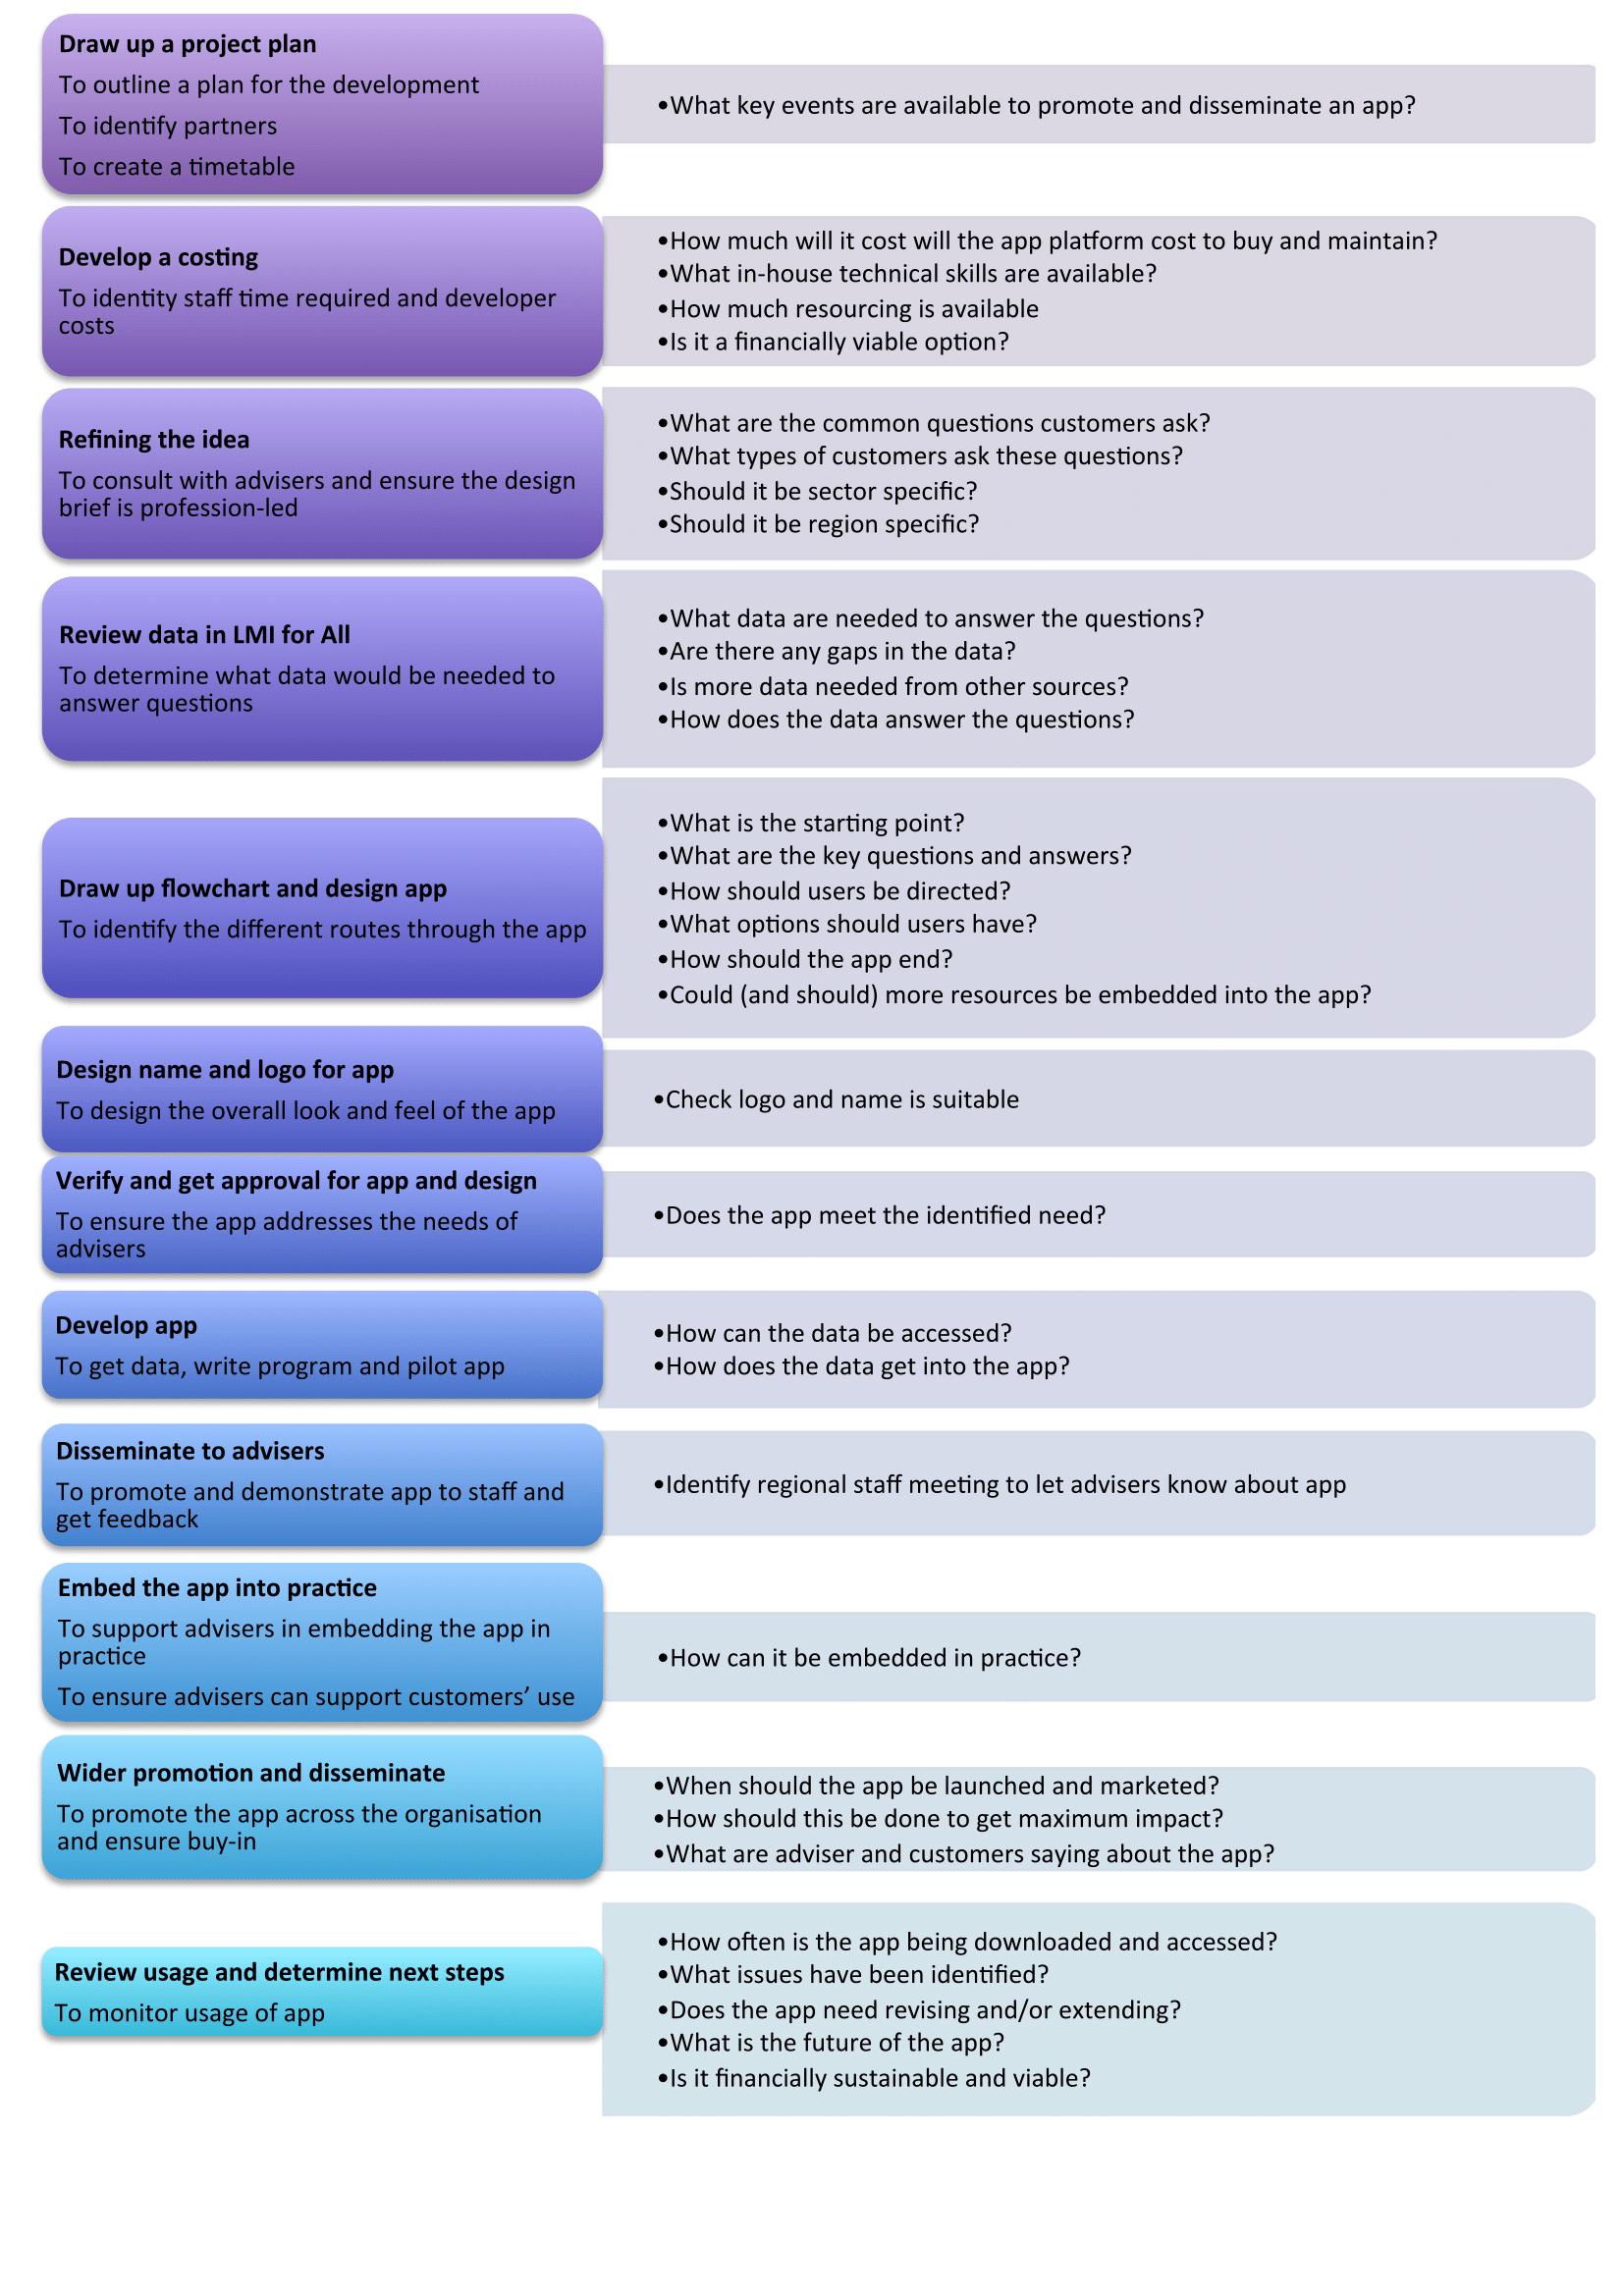 prospects flow chart-1